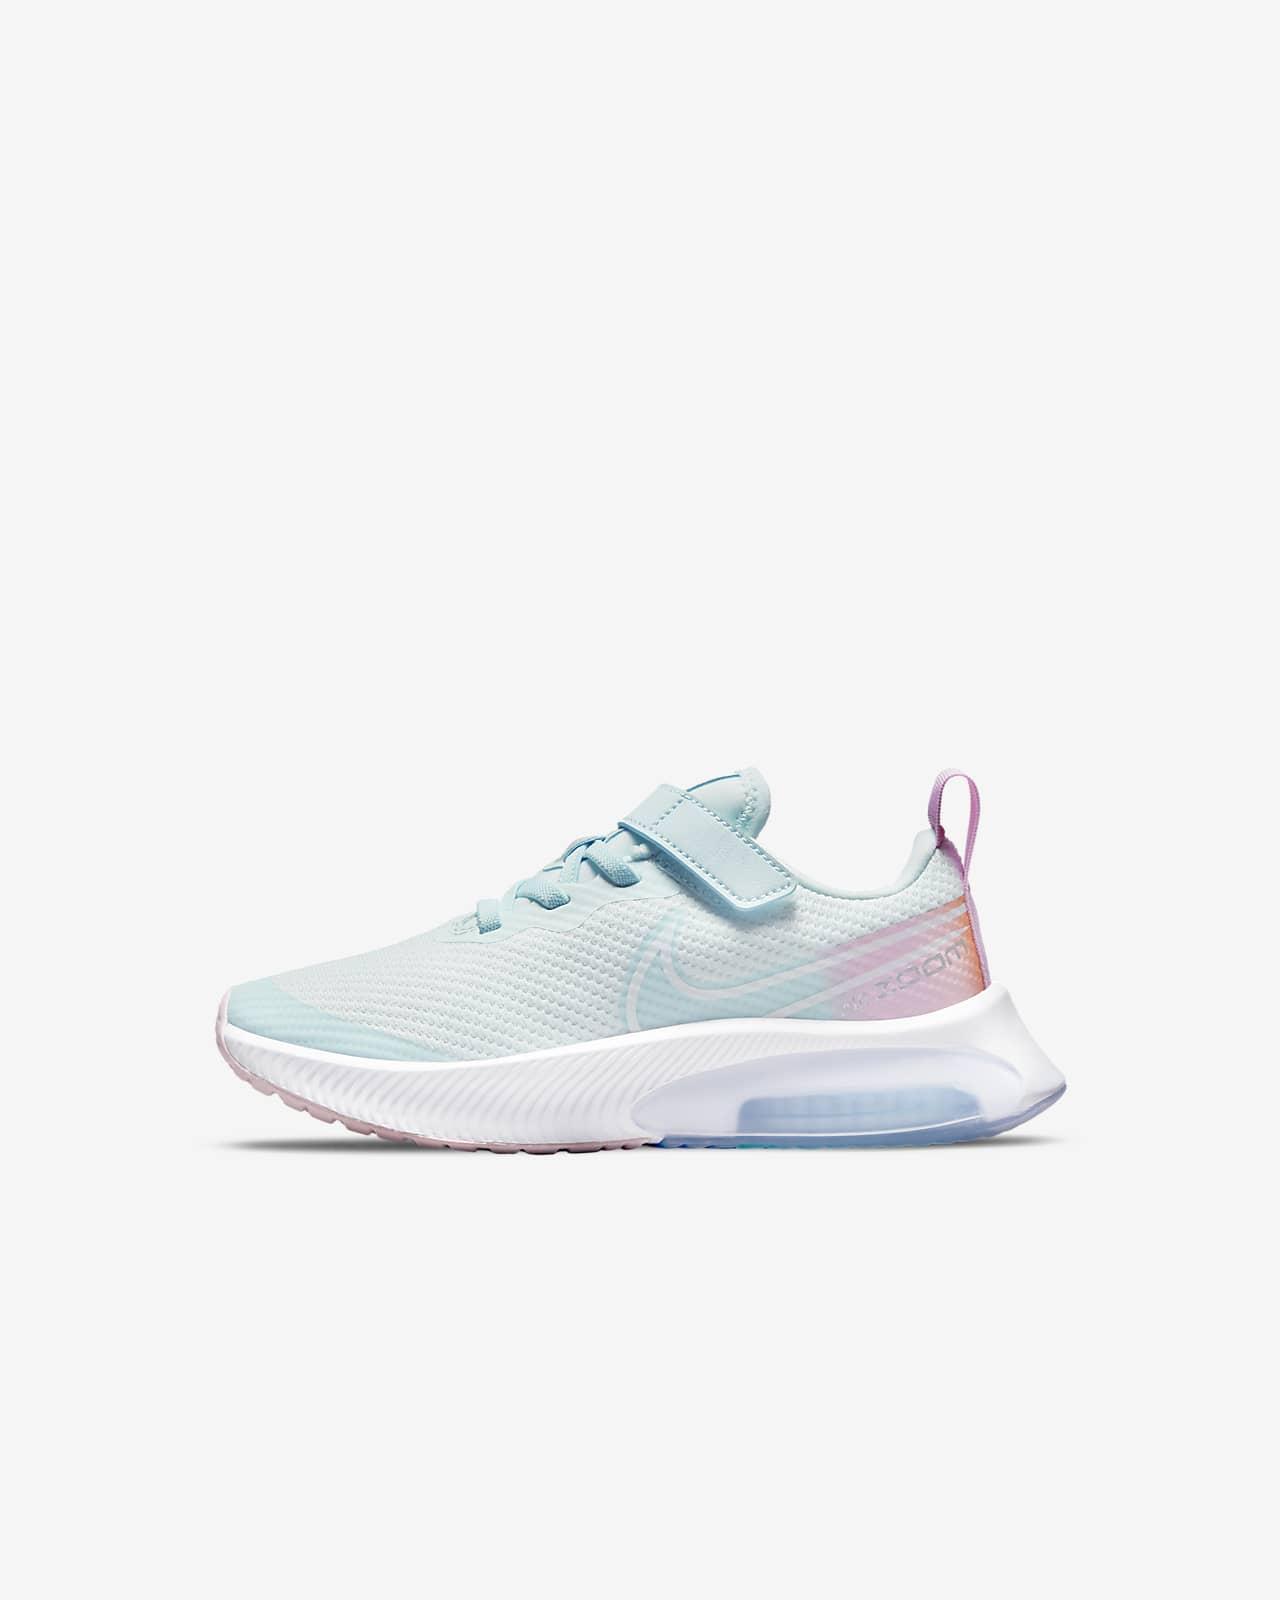 Nike Air Zoom Arcadia SE Little Kids' Shoes